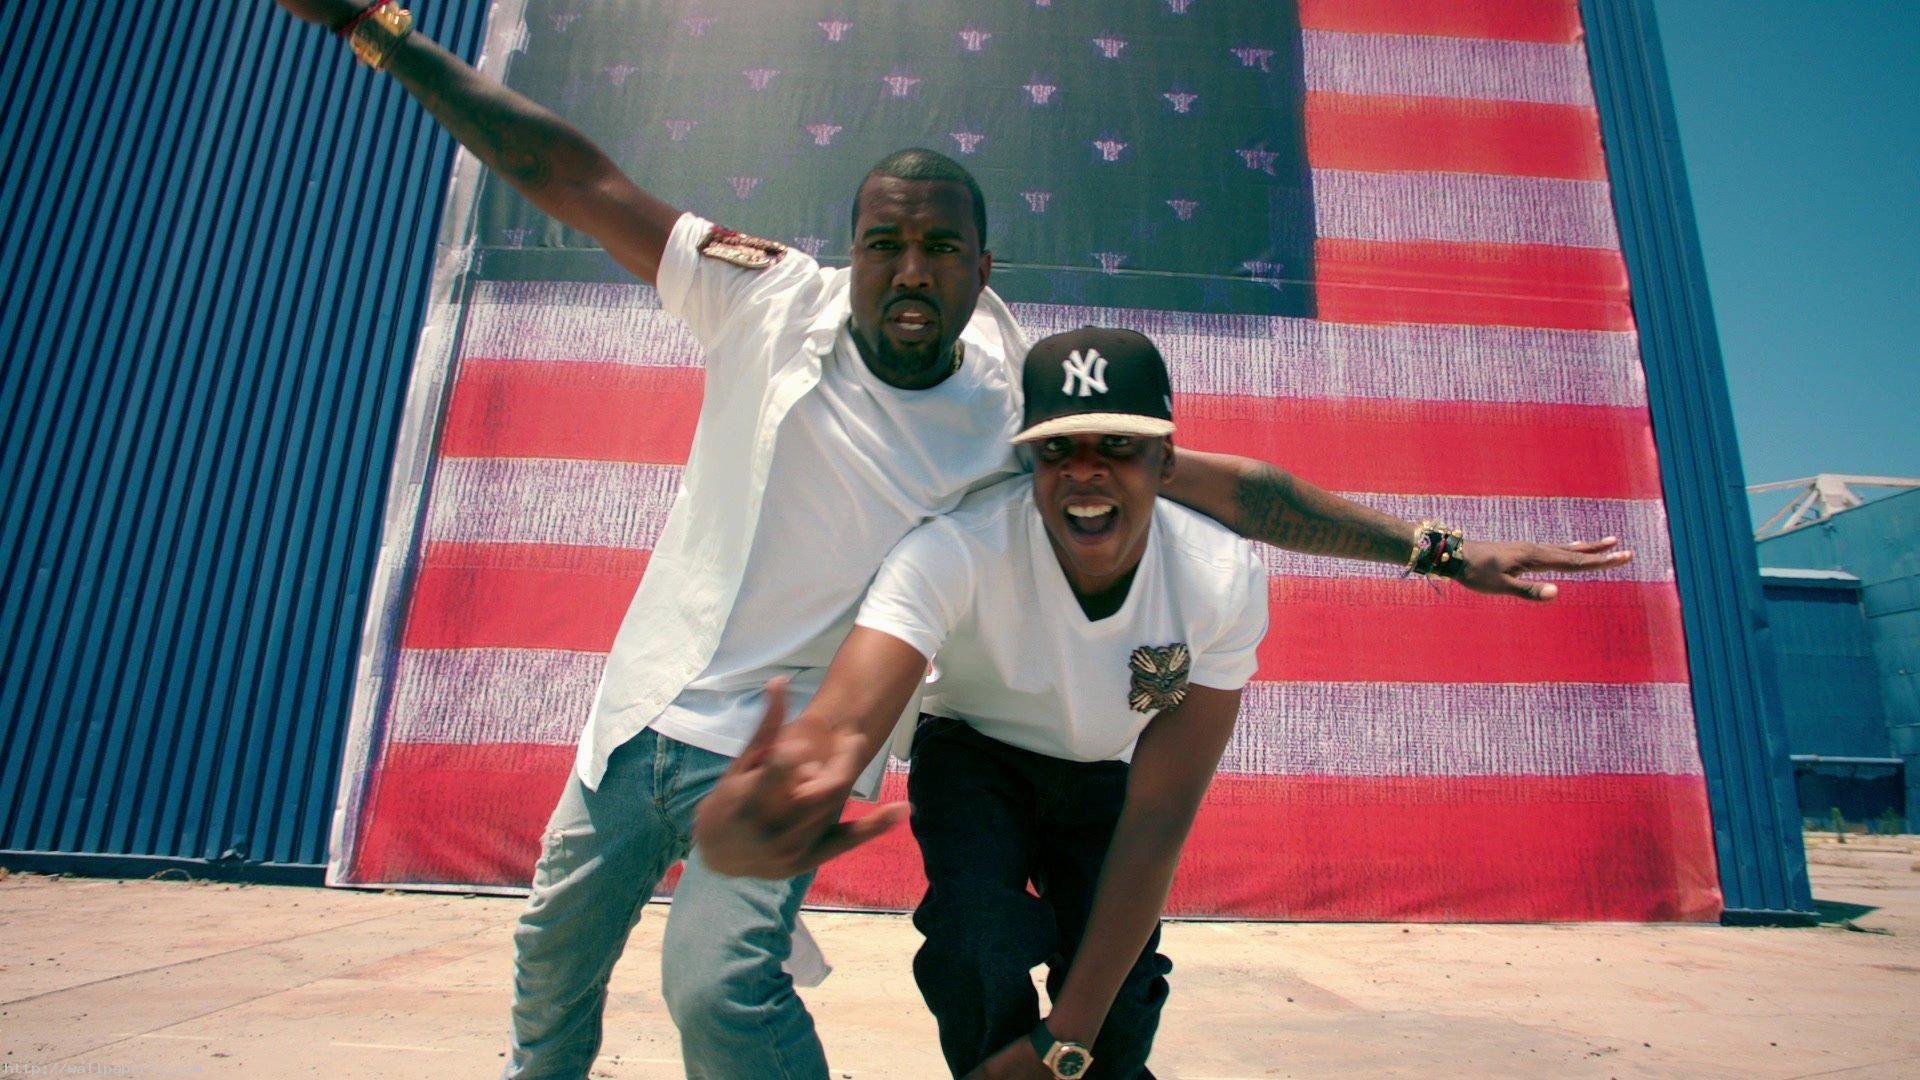 Kanye West Hd Wallpaper Power 2048 1365 Kanye West Wallpaper 41 Wallpapers Adorable Wallpapers Jay Z Kanye West Kanye West Otis Jay Z